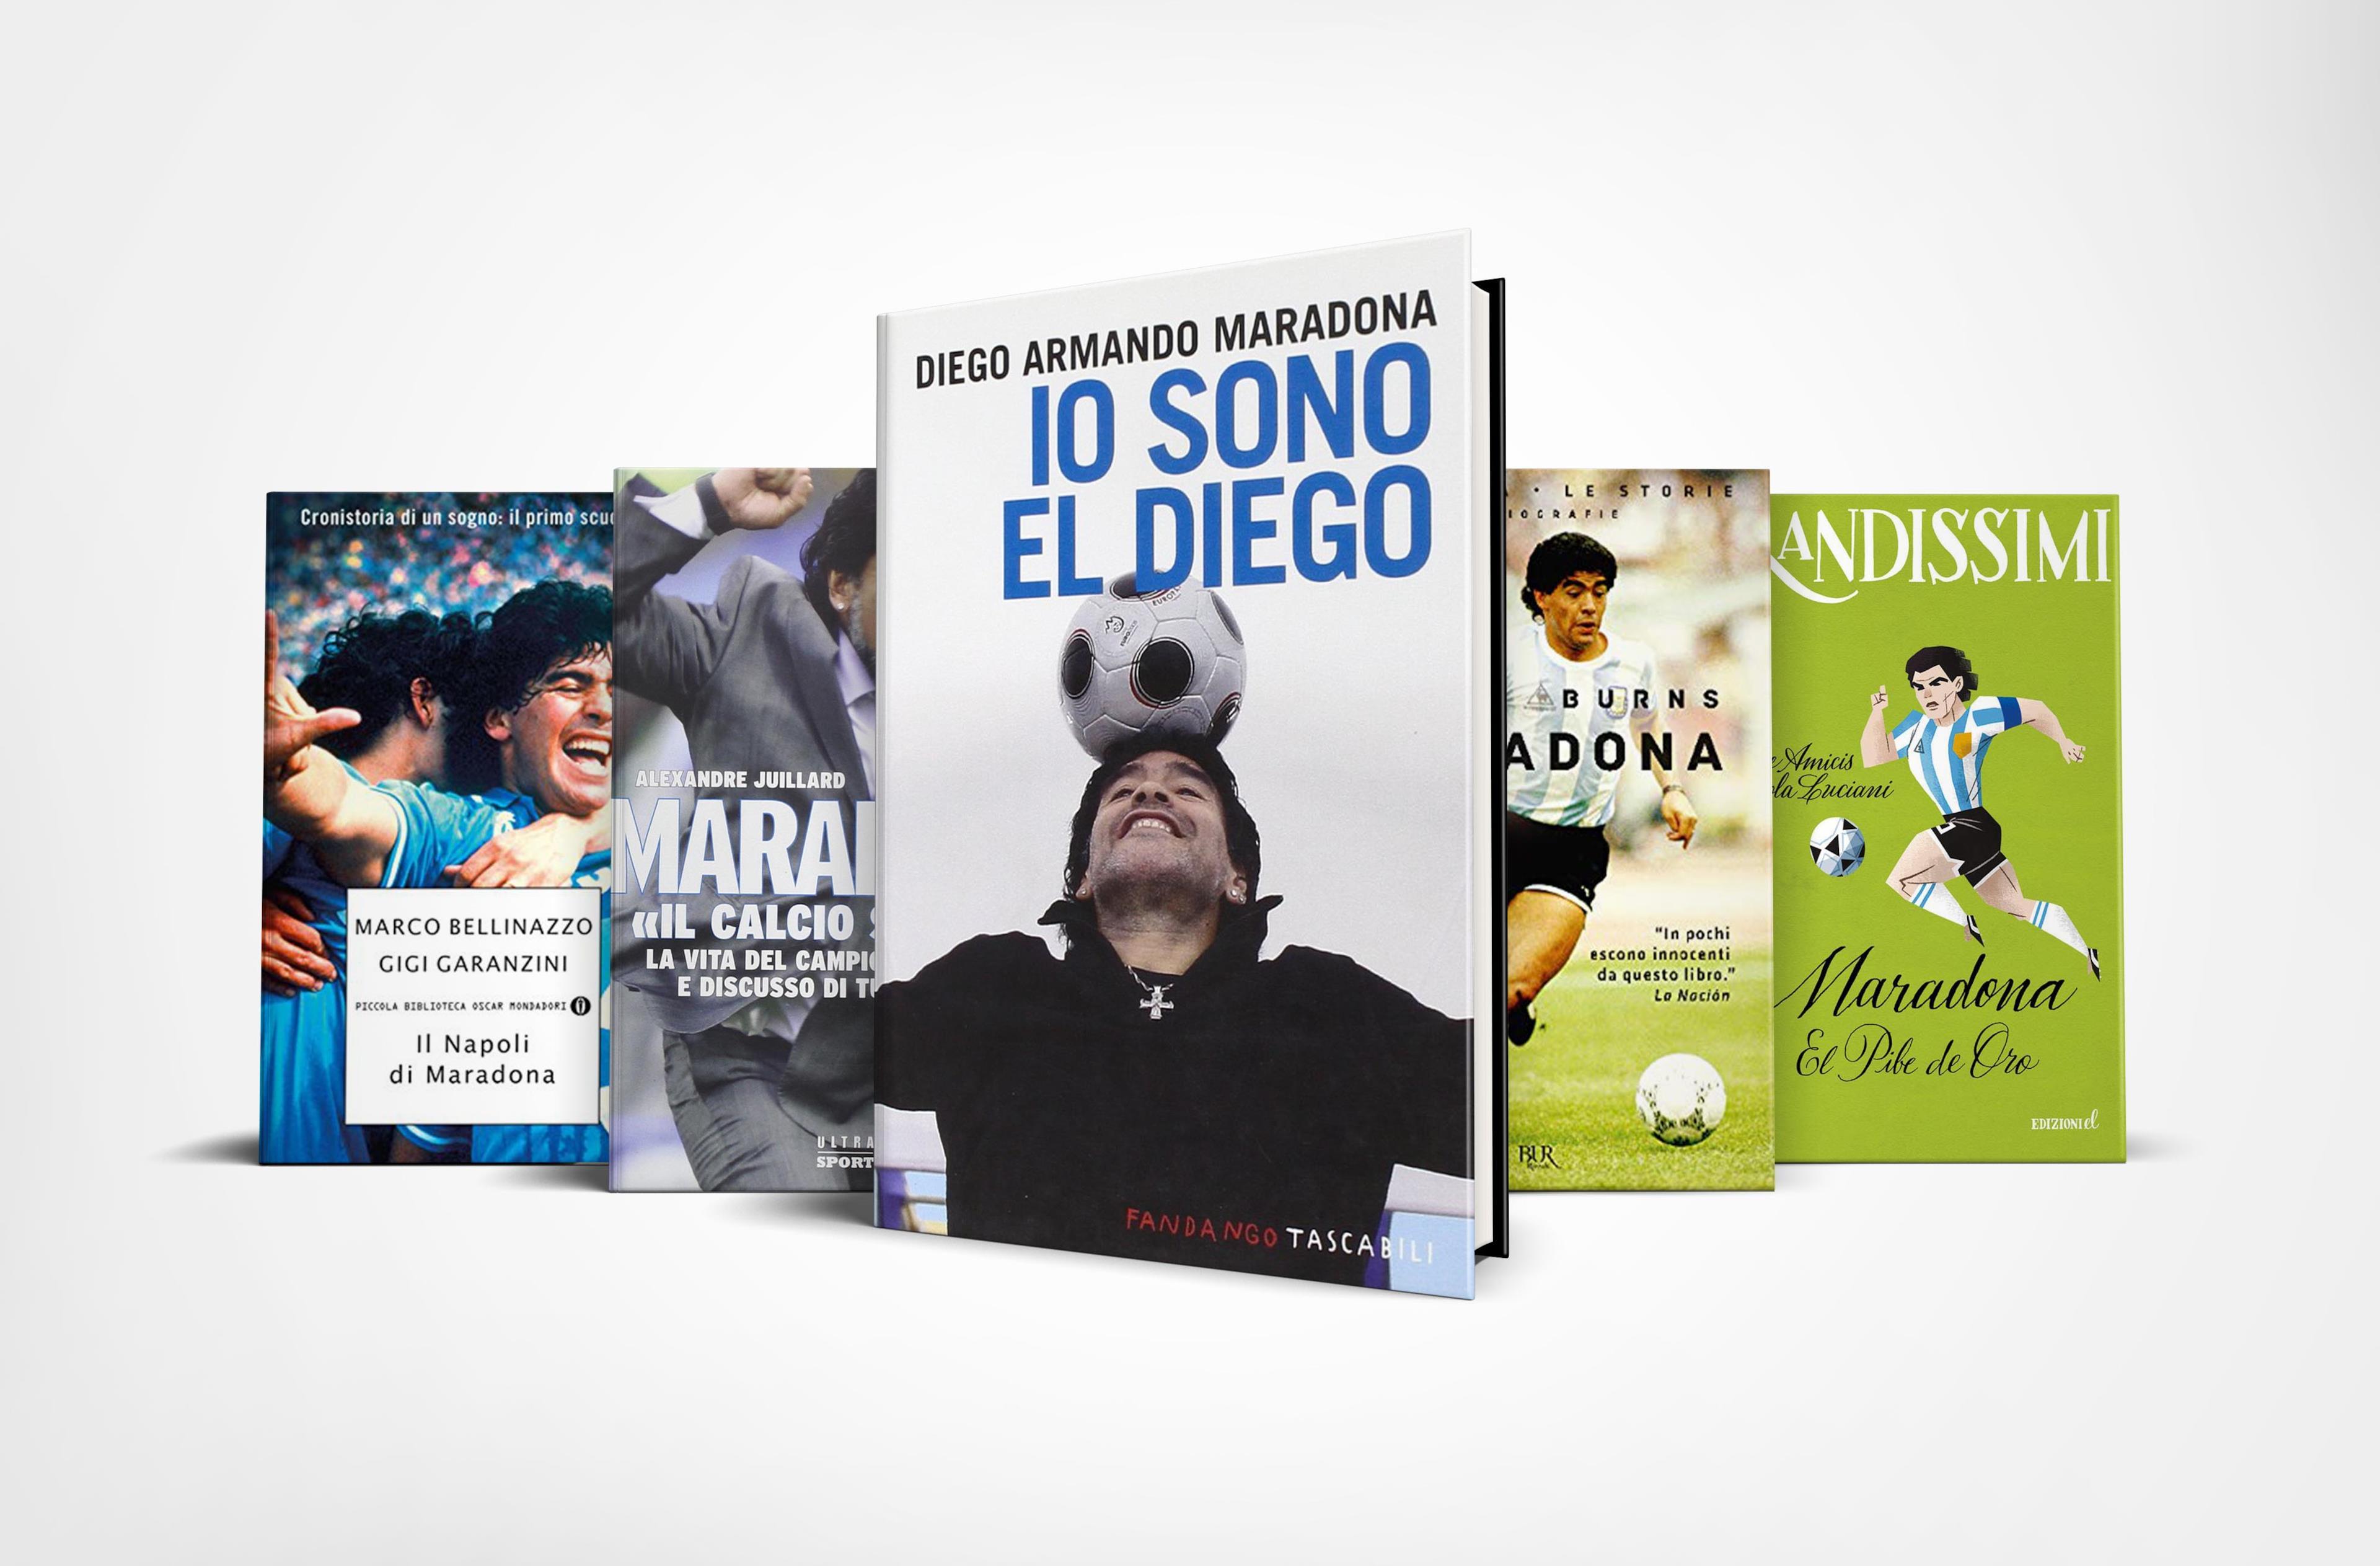 Maradona sorride